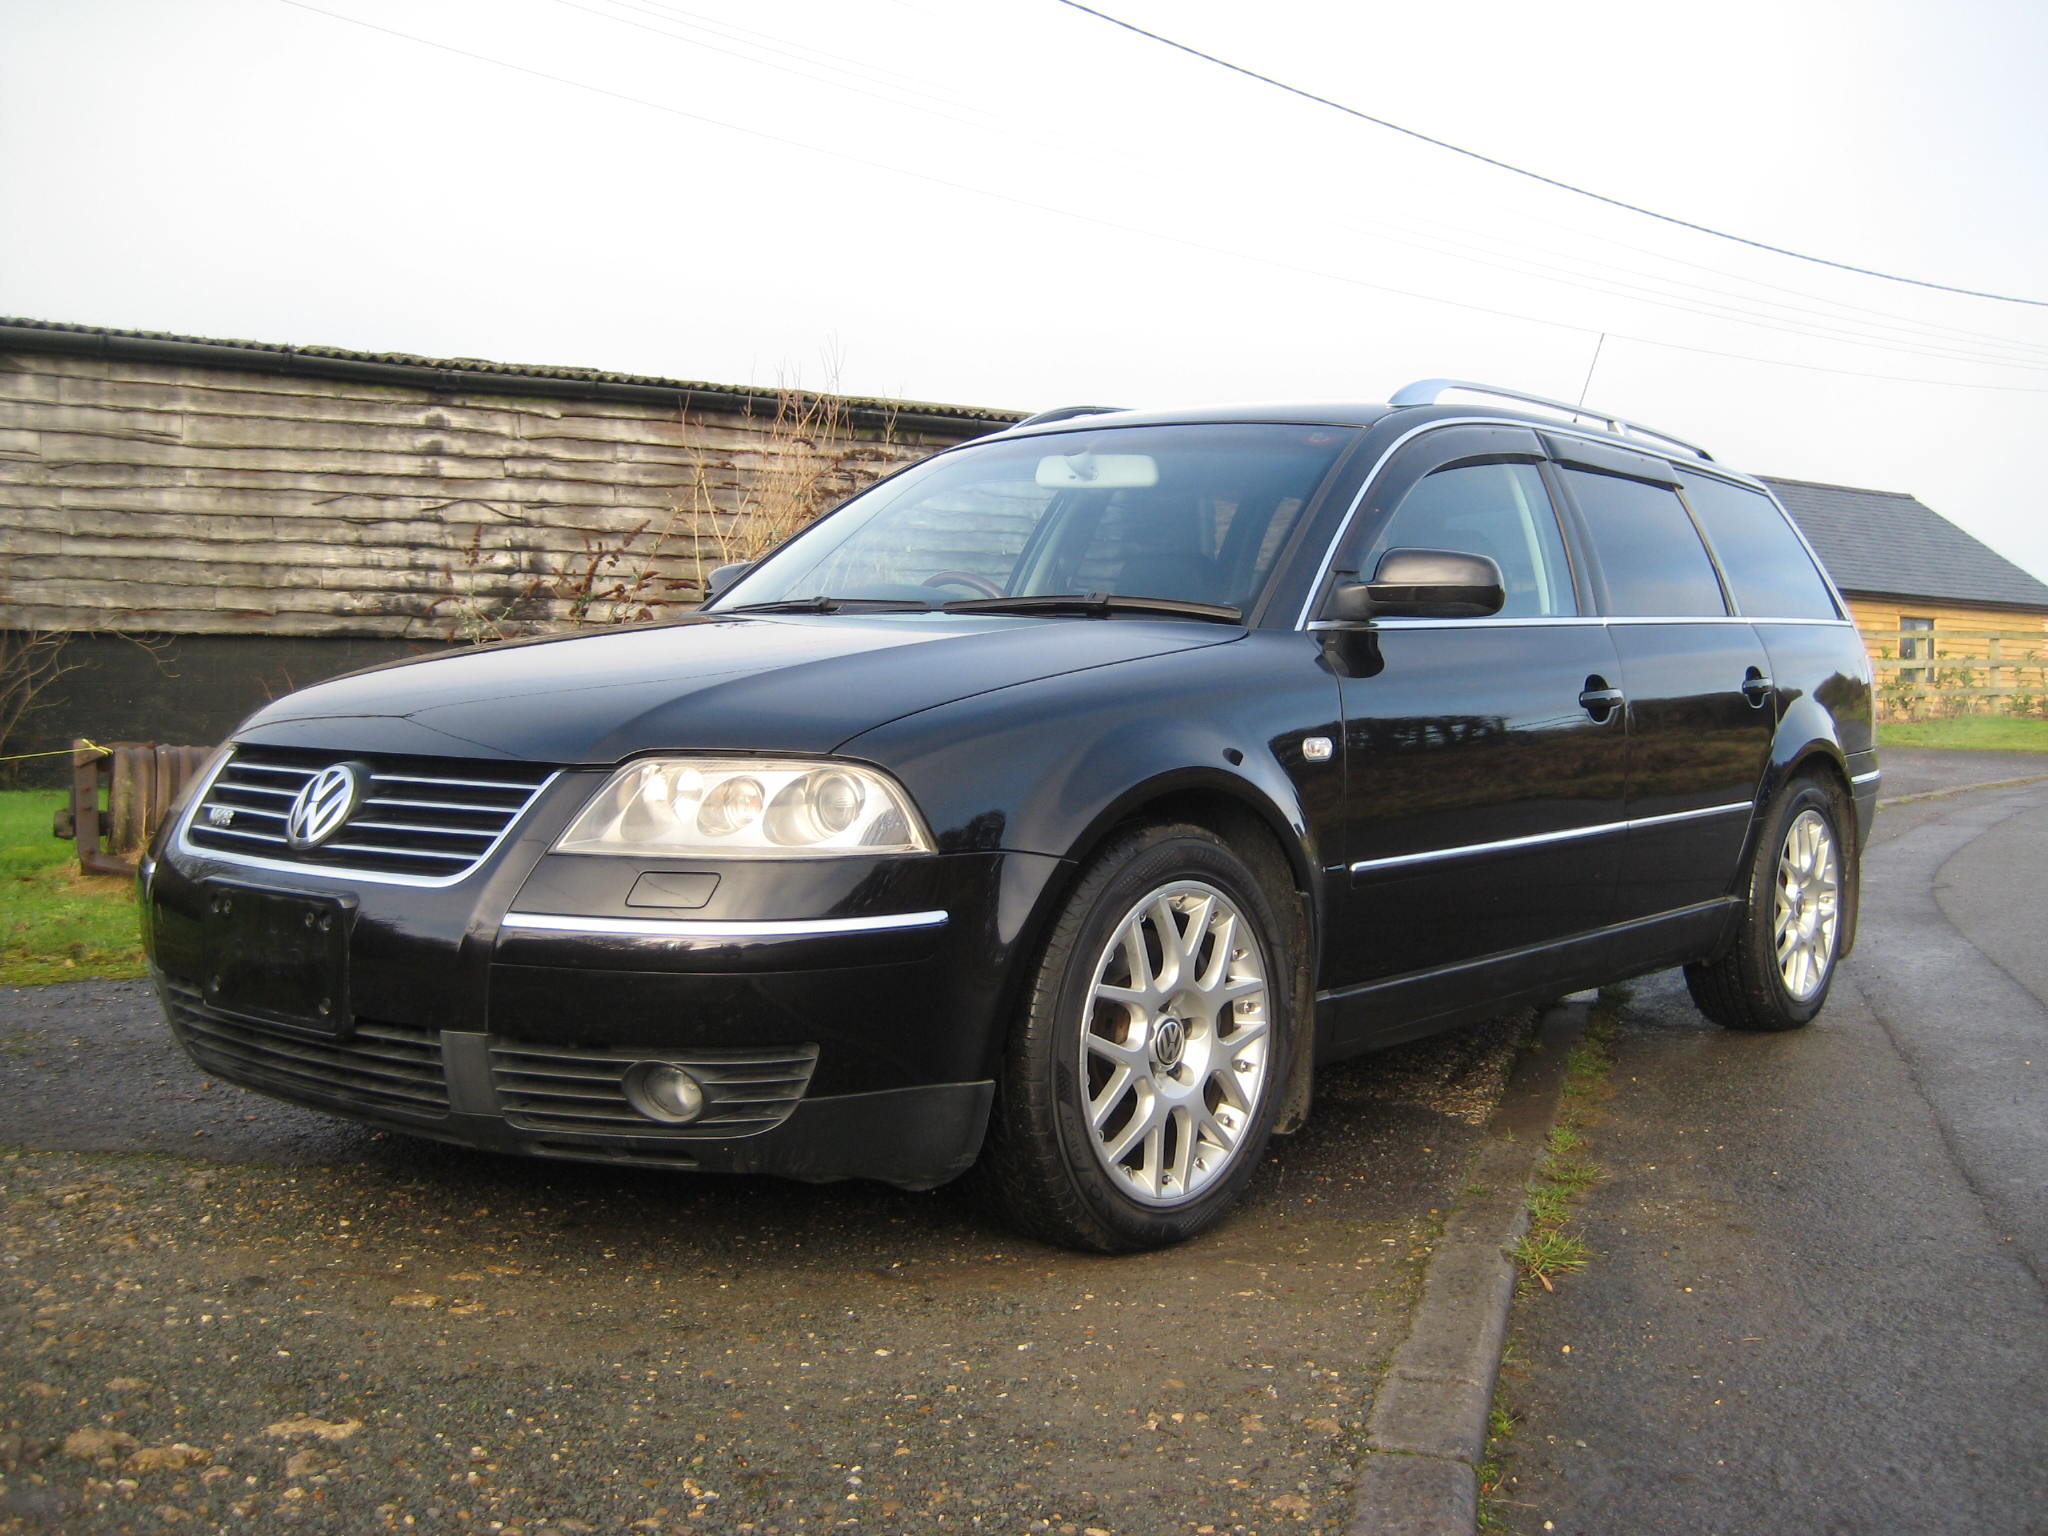 2002 VW Passat W8 Estate Auto. Low Mileage SOLD. 2005 Silver car on ...